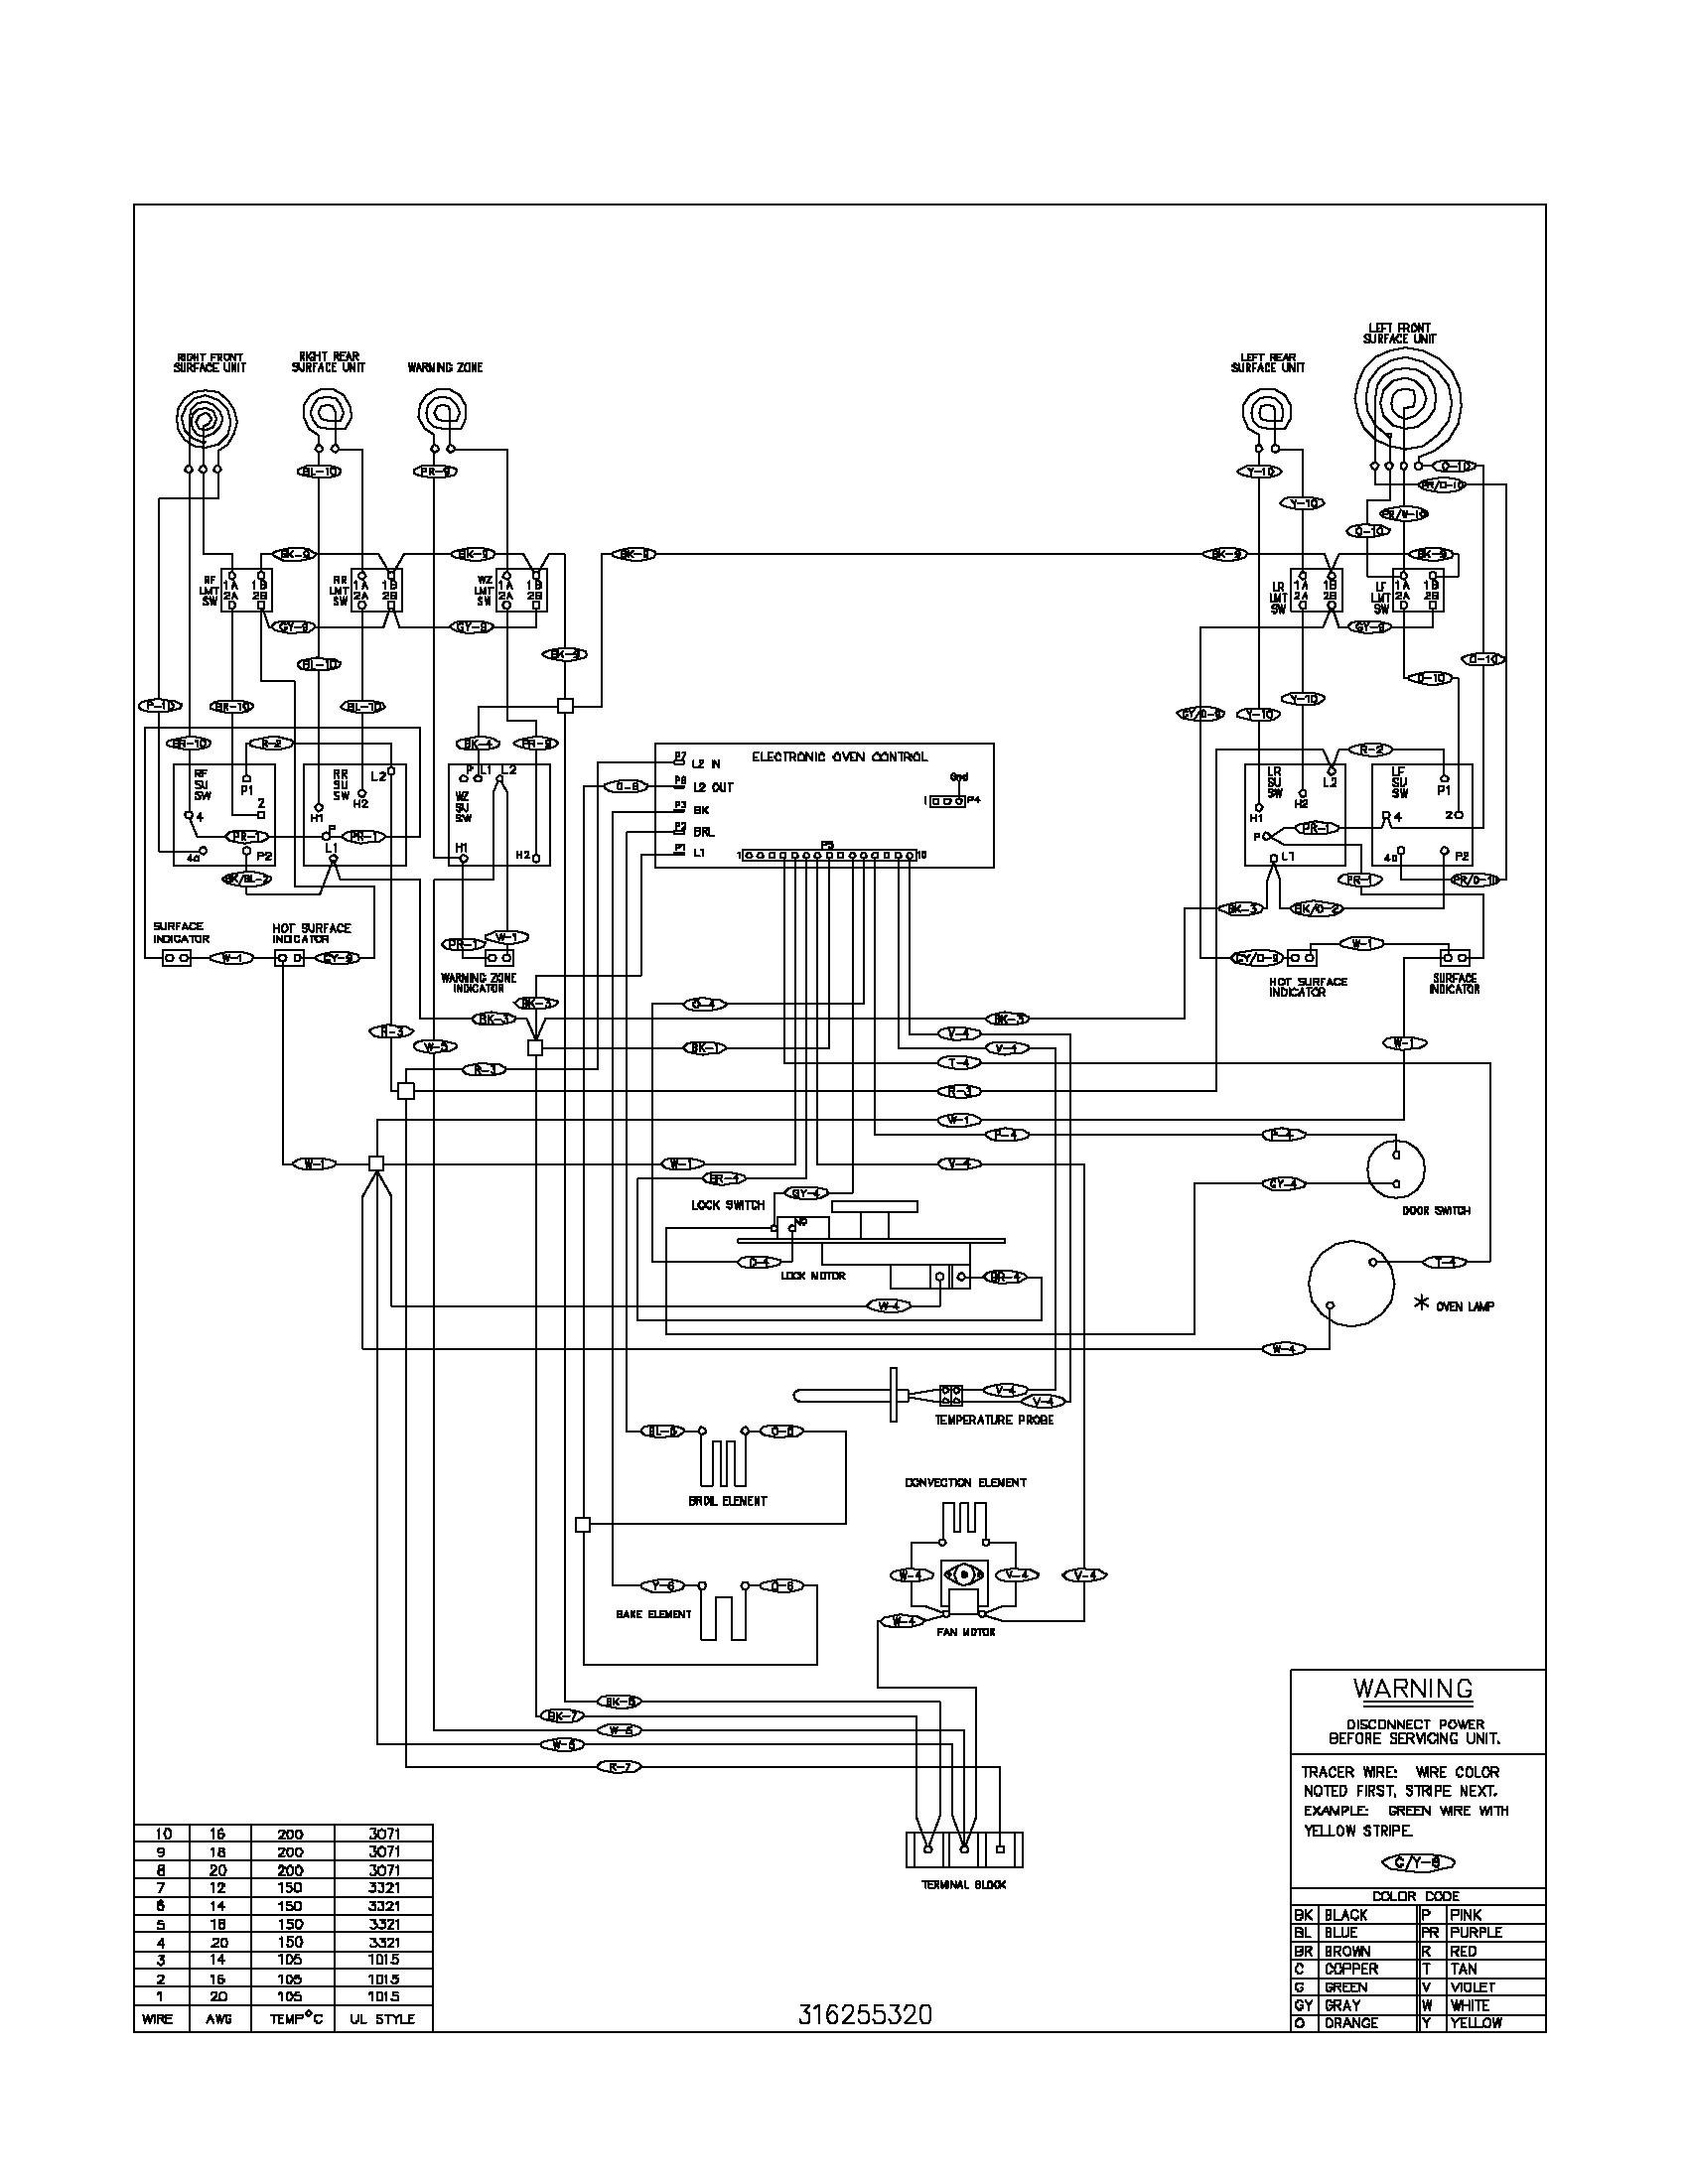 wiring diagram for dryers 14e roper dryer wiring schematic wiring library wiring diagram for kenmore dryer 14e roper dryer wiring schematic